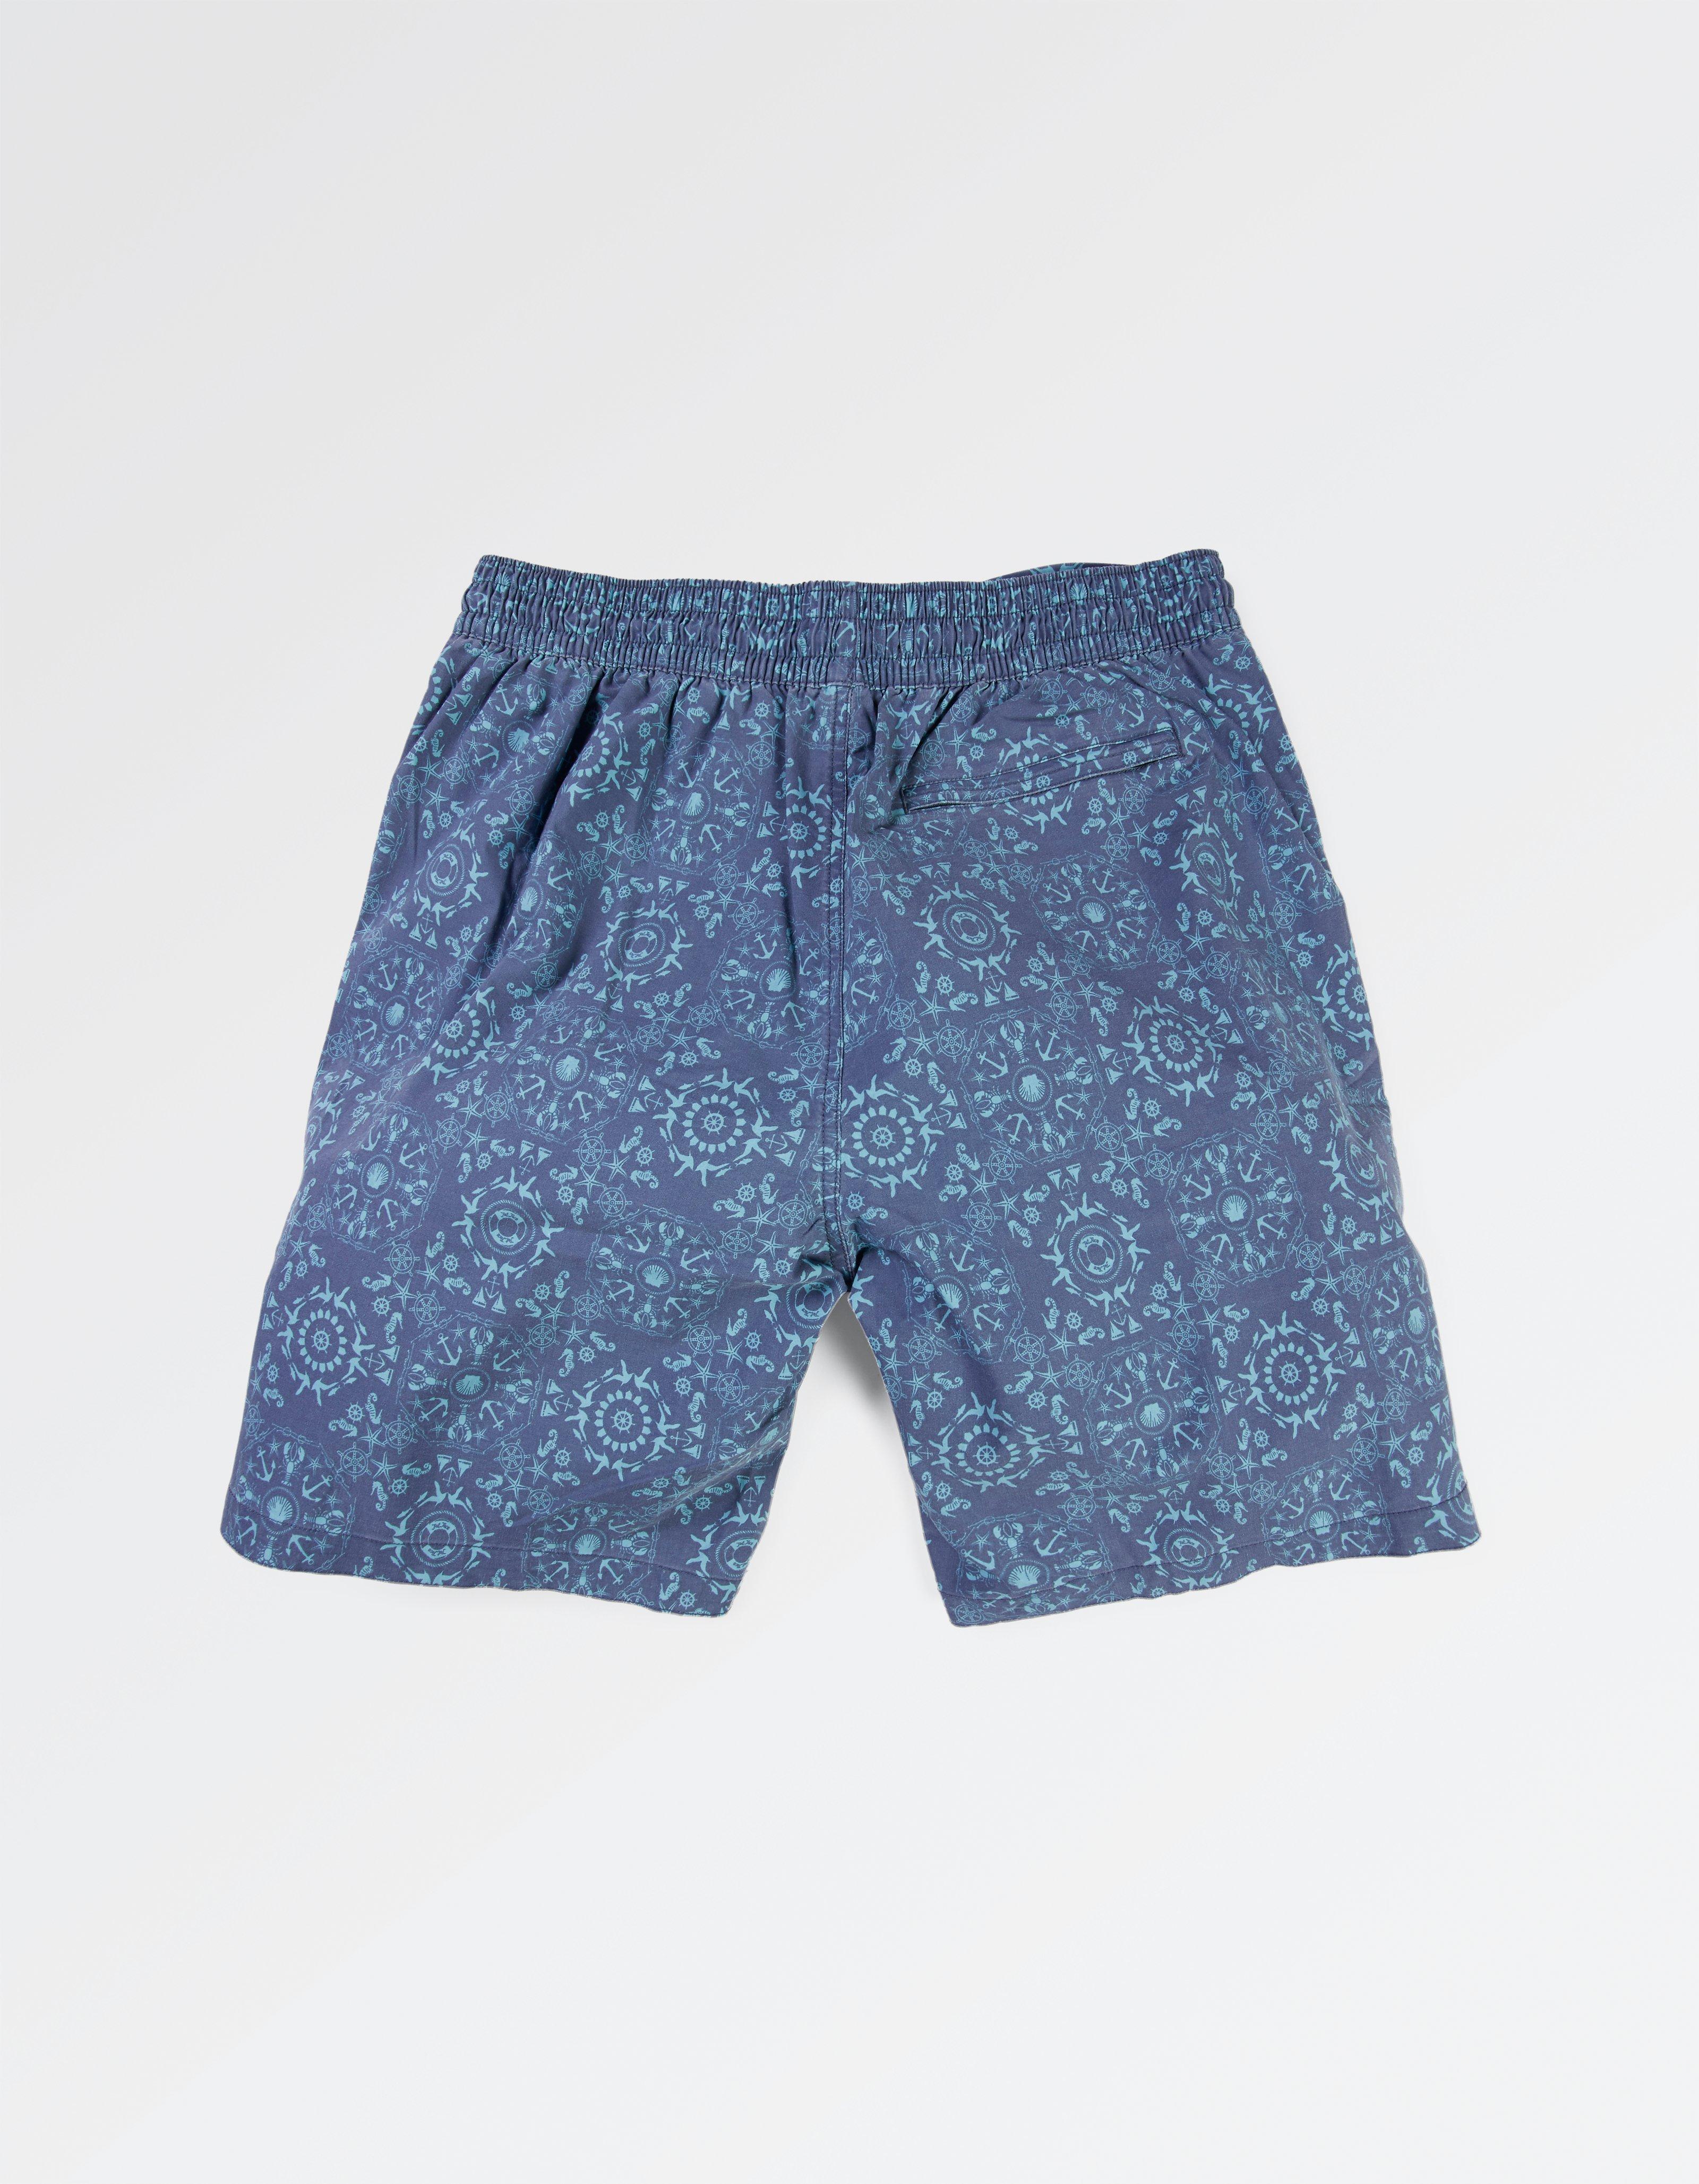 Camber Tile Print Swim Shorts